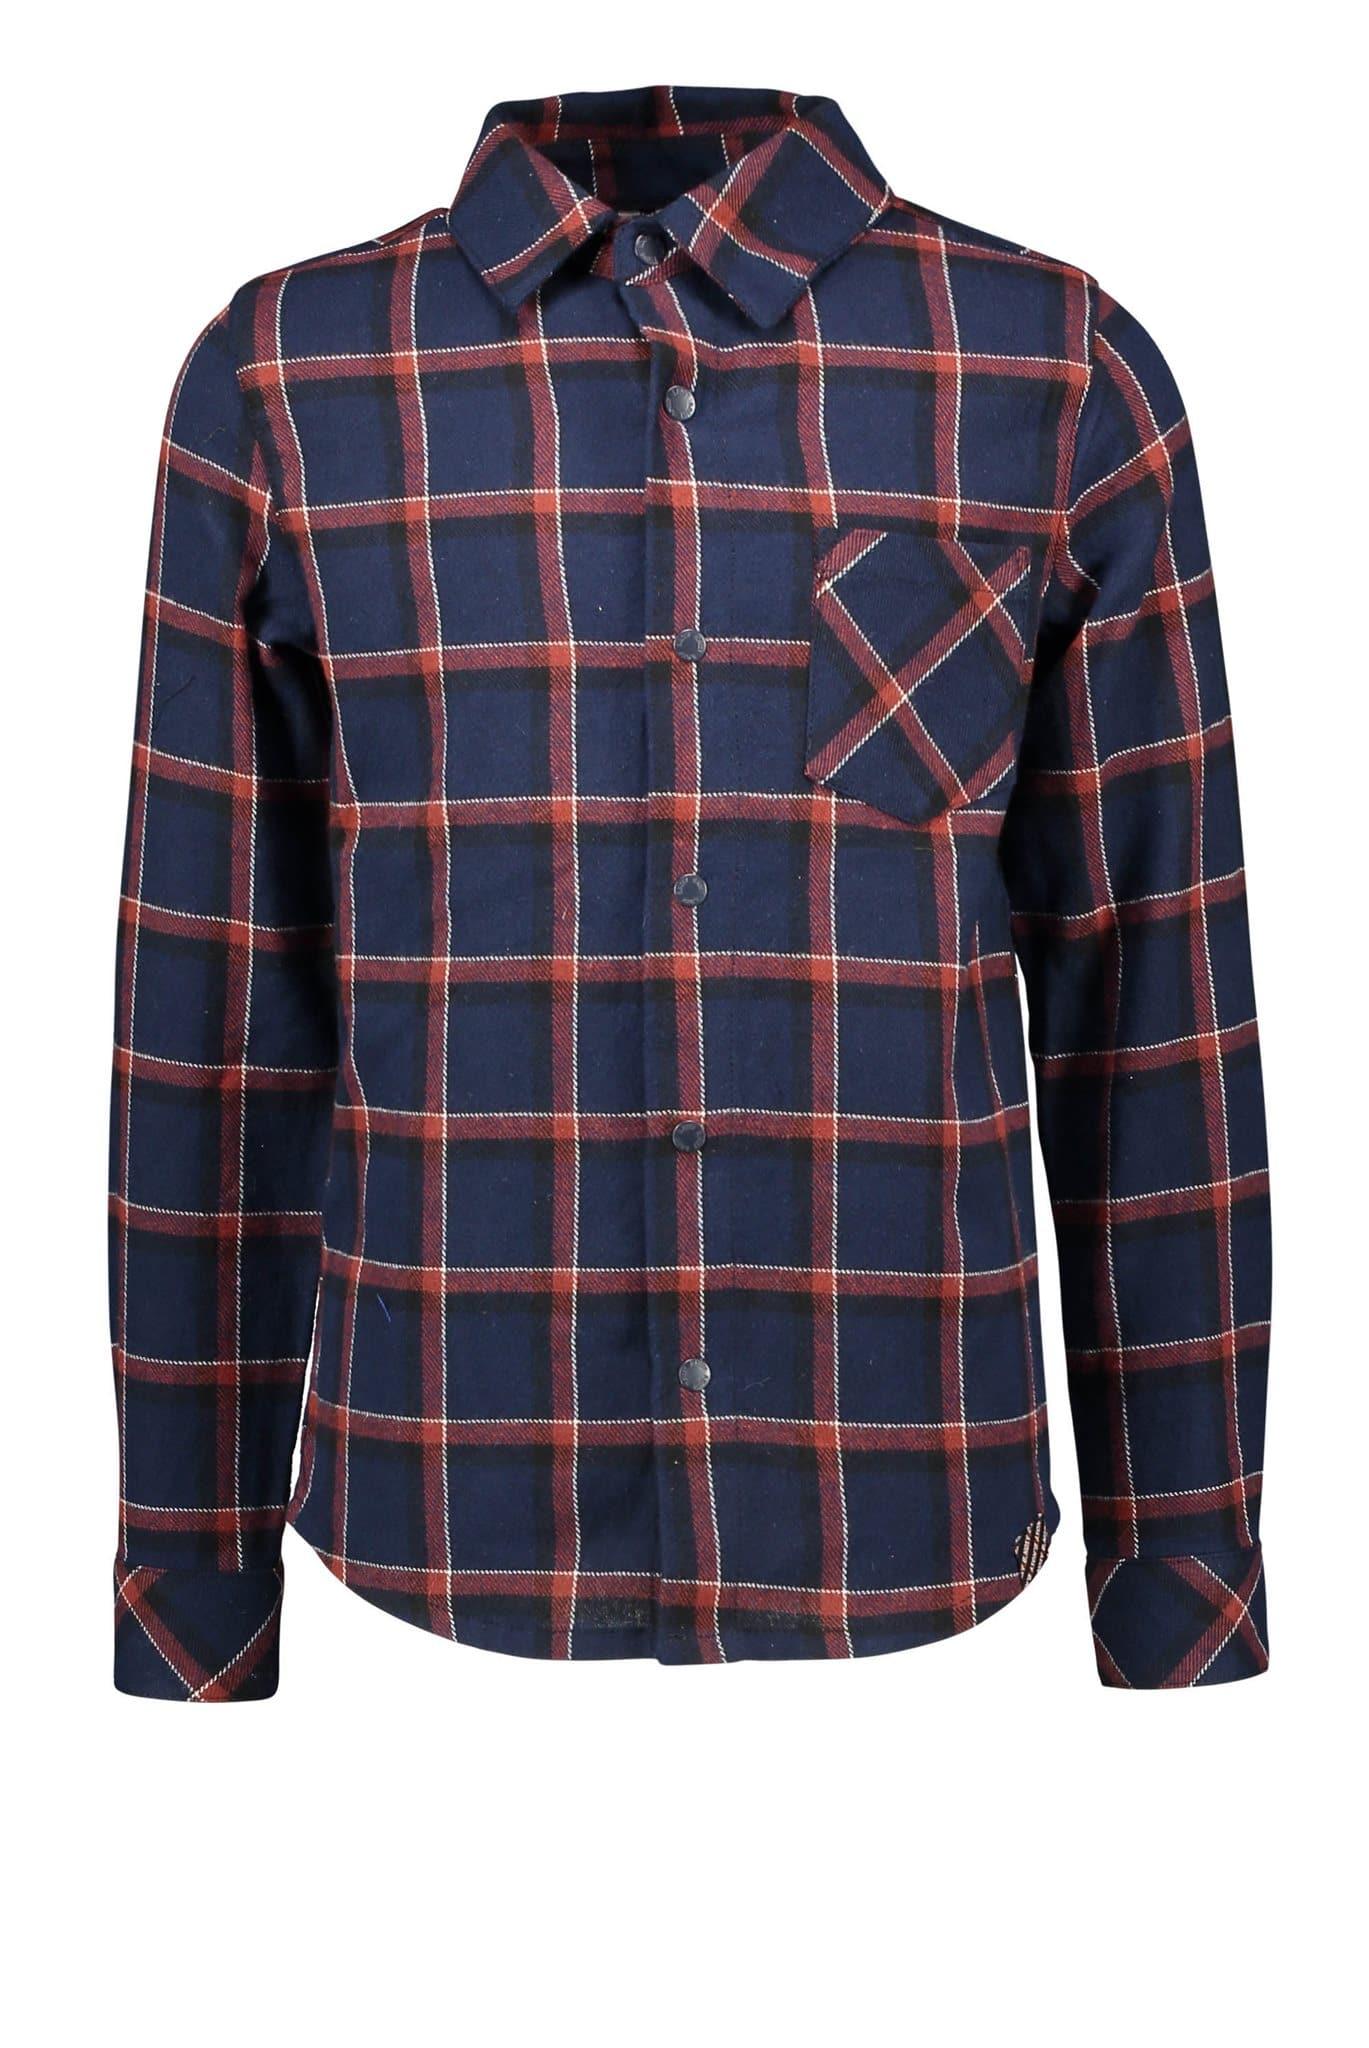 B.NOSY Big Check Woven Shirt